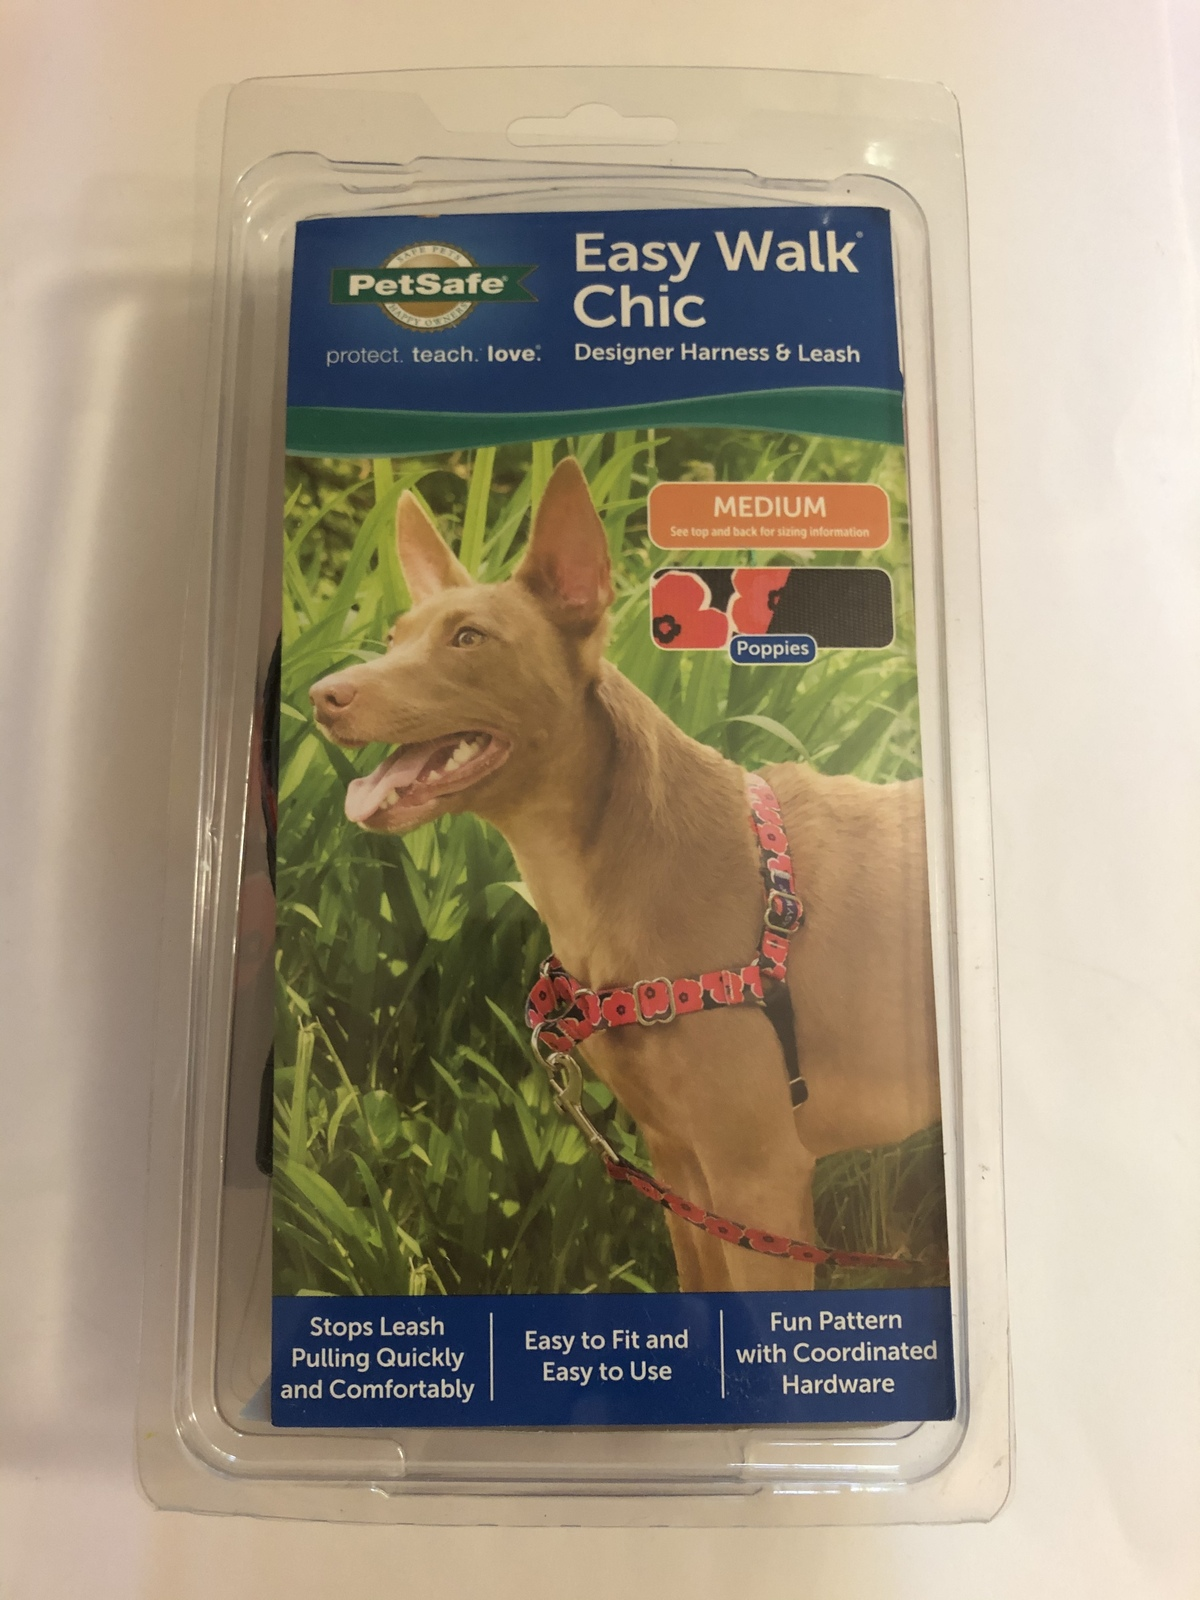 PetSafe Easy Walk Chic Harness Size Medium Poppies Design - $27.95